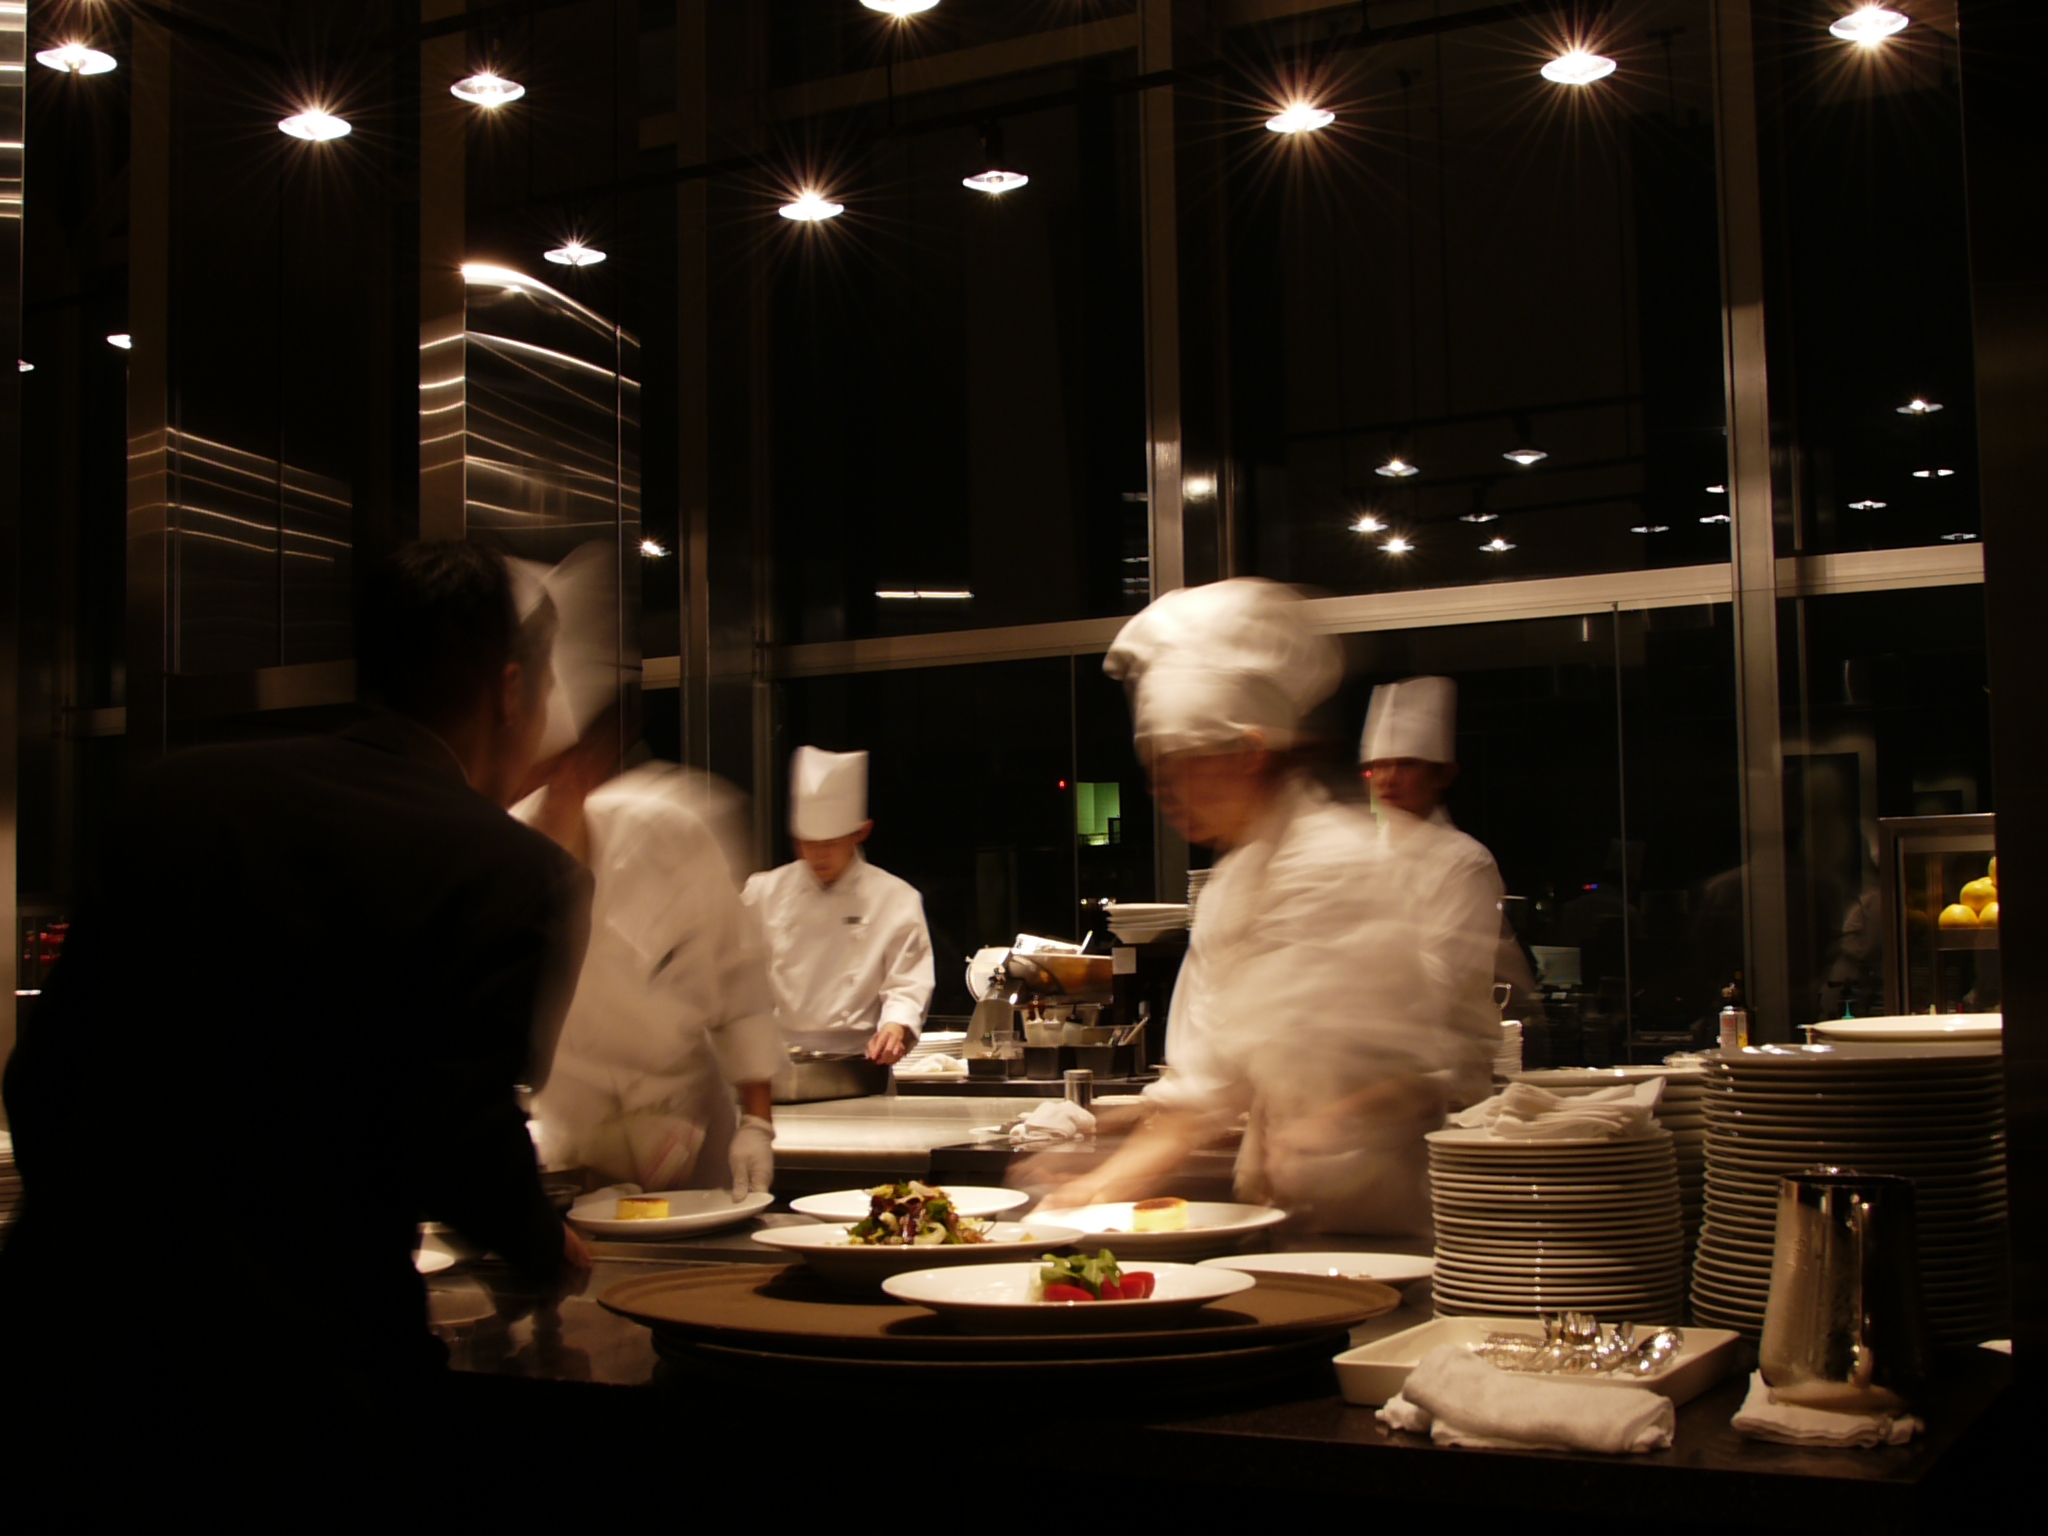 Quintessentially - Lifestyle Management - Chefs in kitchen